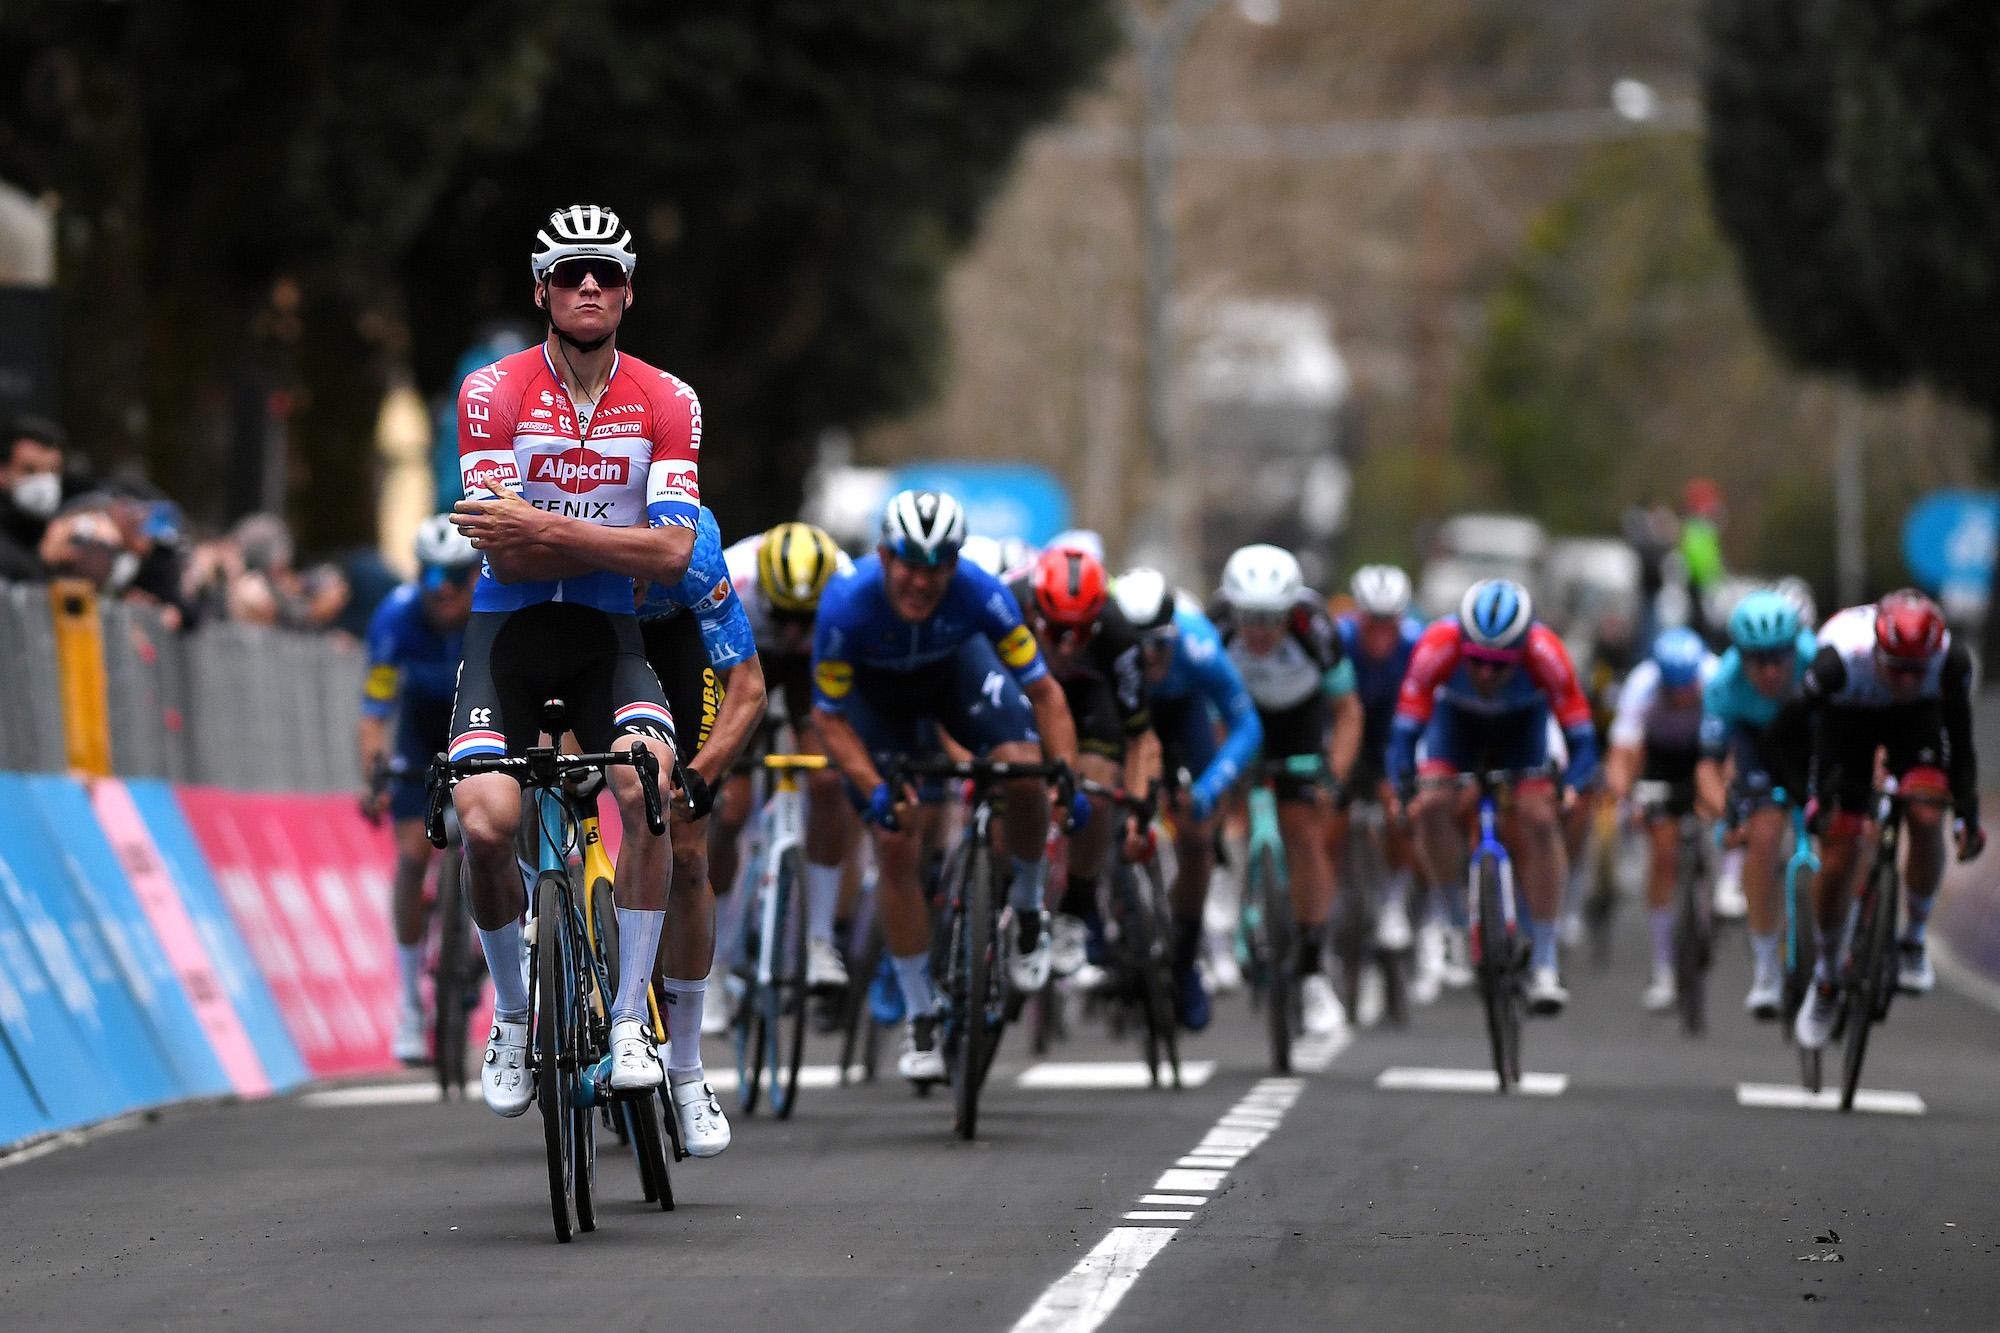 Mathieu van der Poel griber sejr fra Wout van Aert på tredje etape i Tirreno-Adriatico 2021